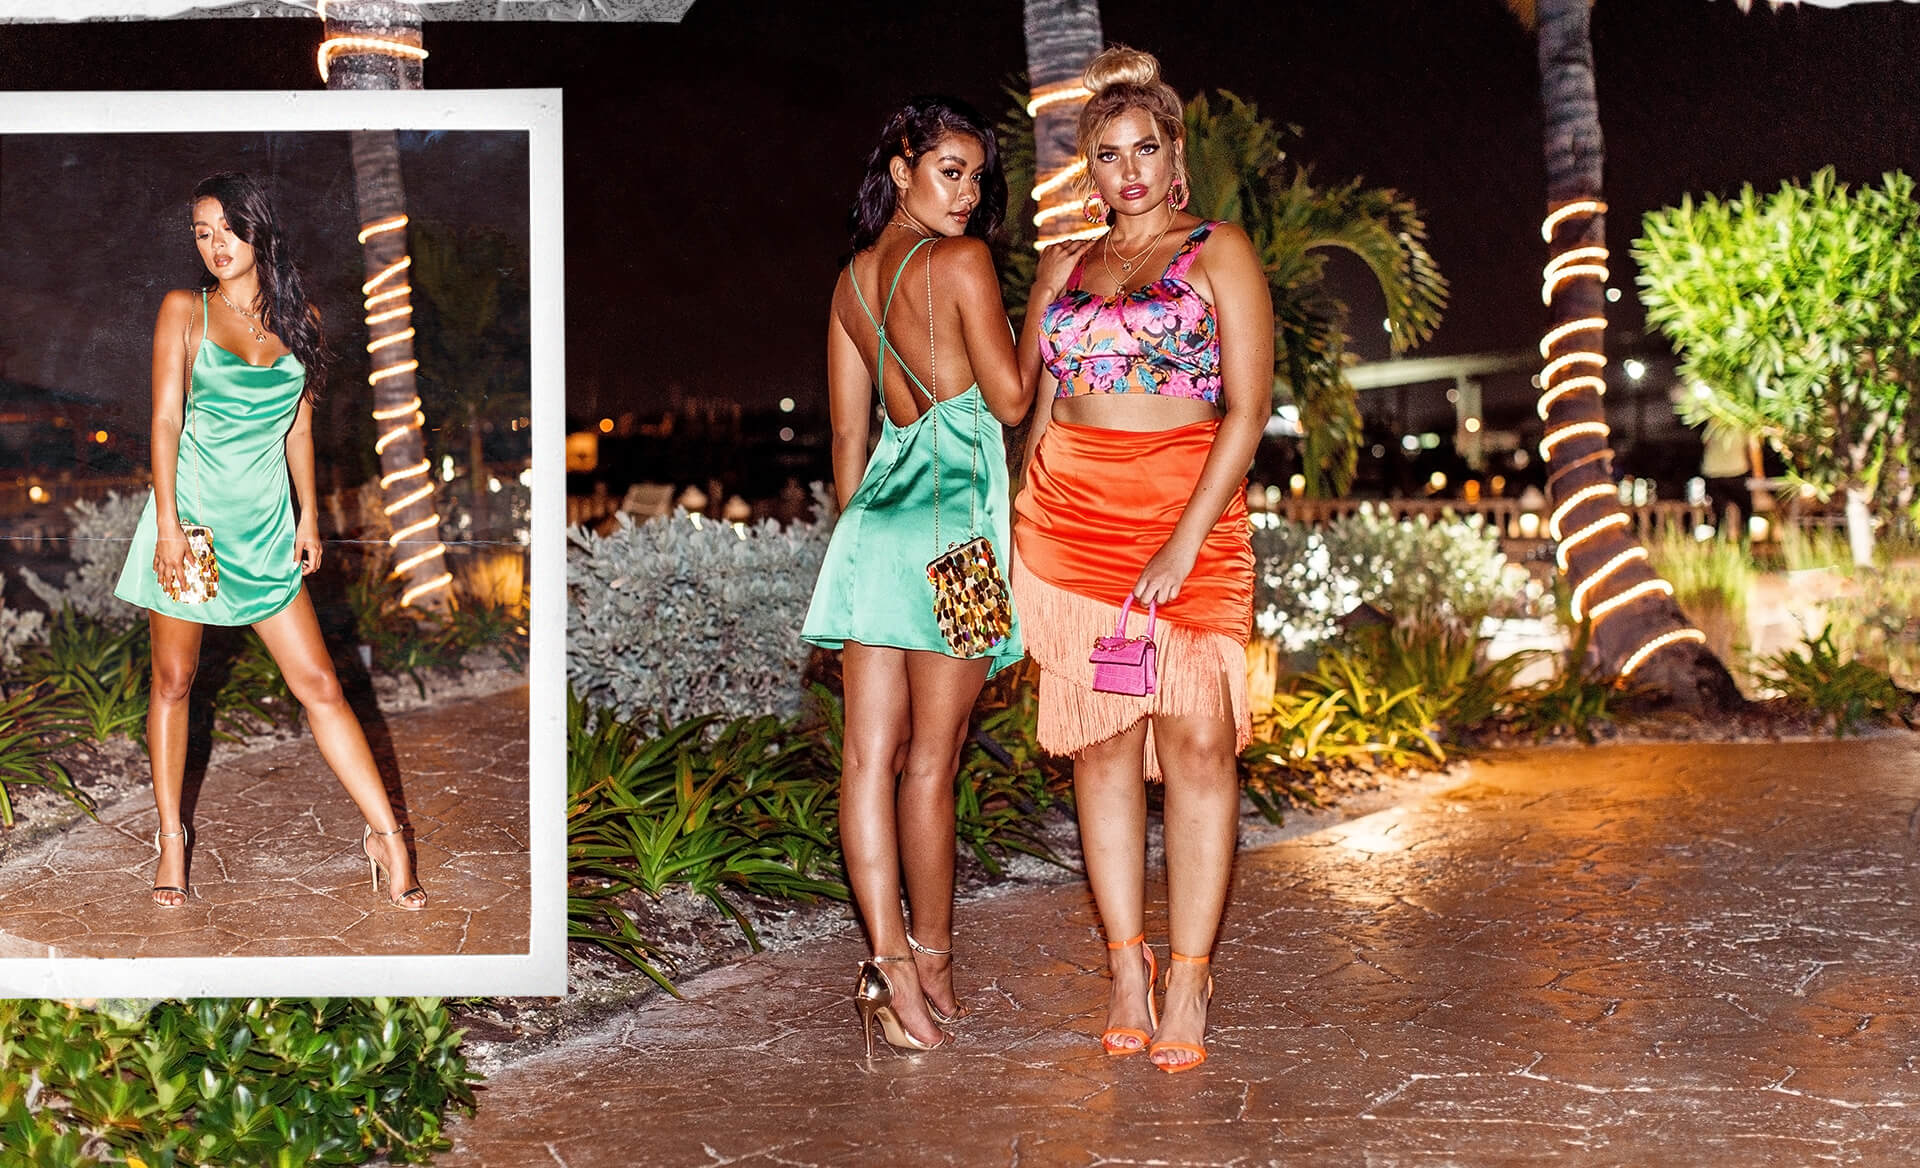 Green Satin Cowl Neck Shift Dress, Plus Orange Floral Cup Detail Crop Top, Plus Orange Satin Ruched Side Tassel Bodycon Skirt